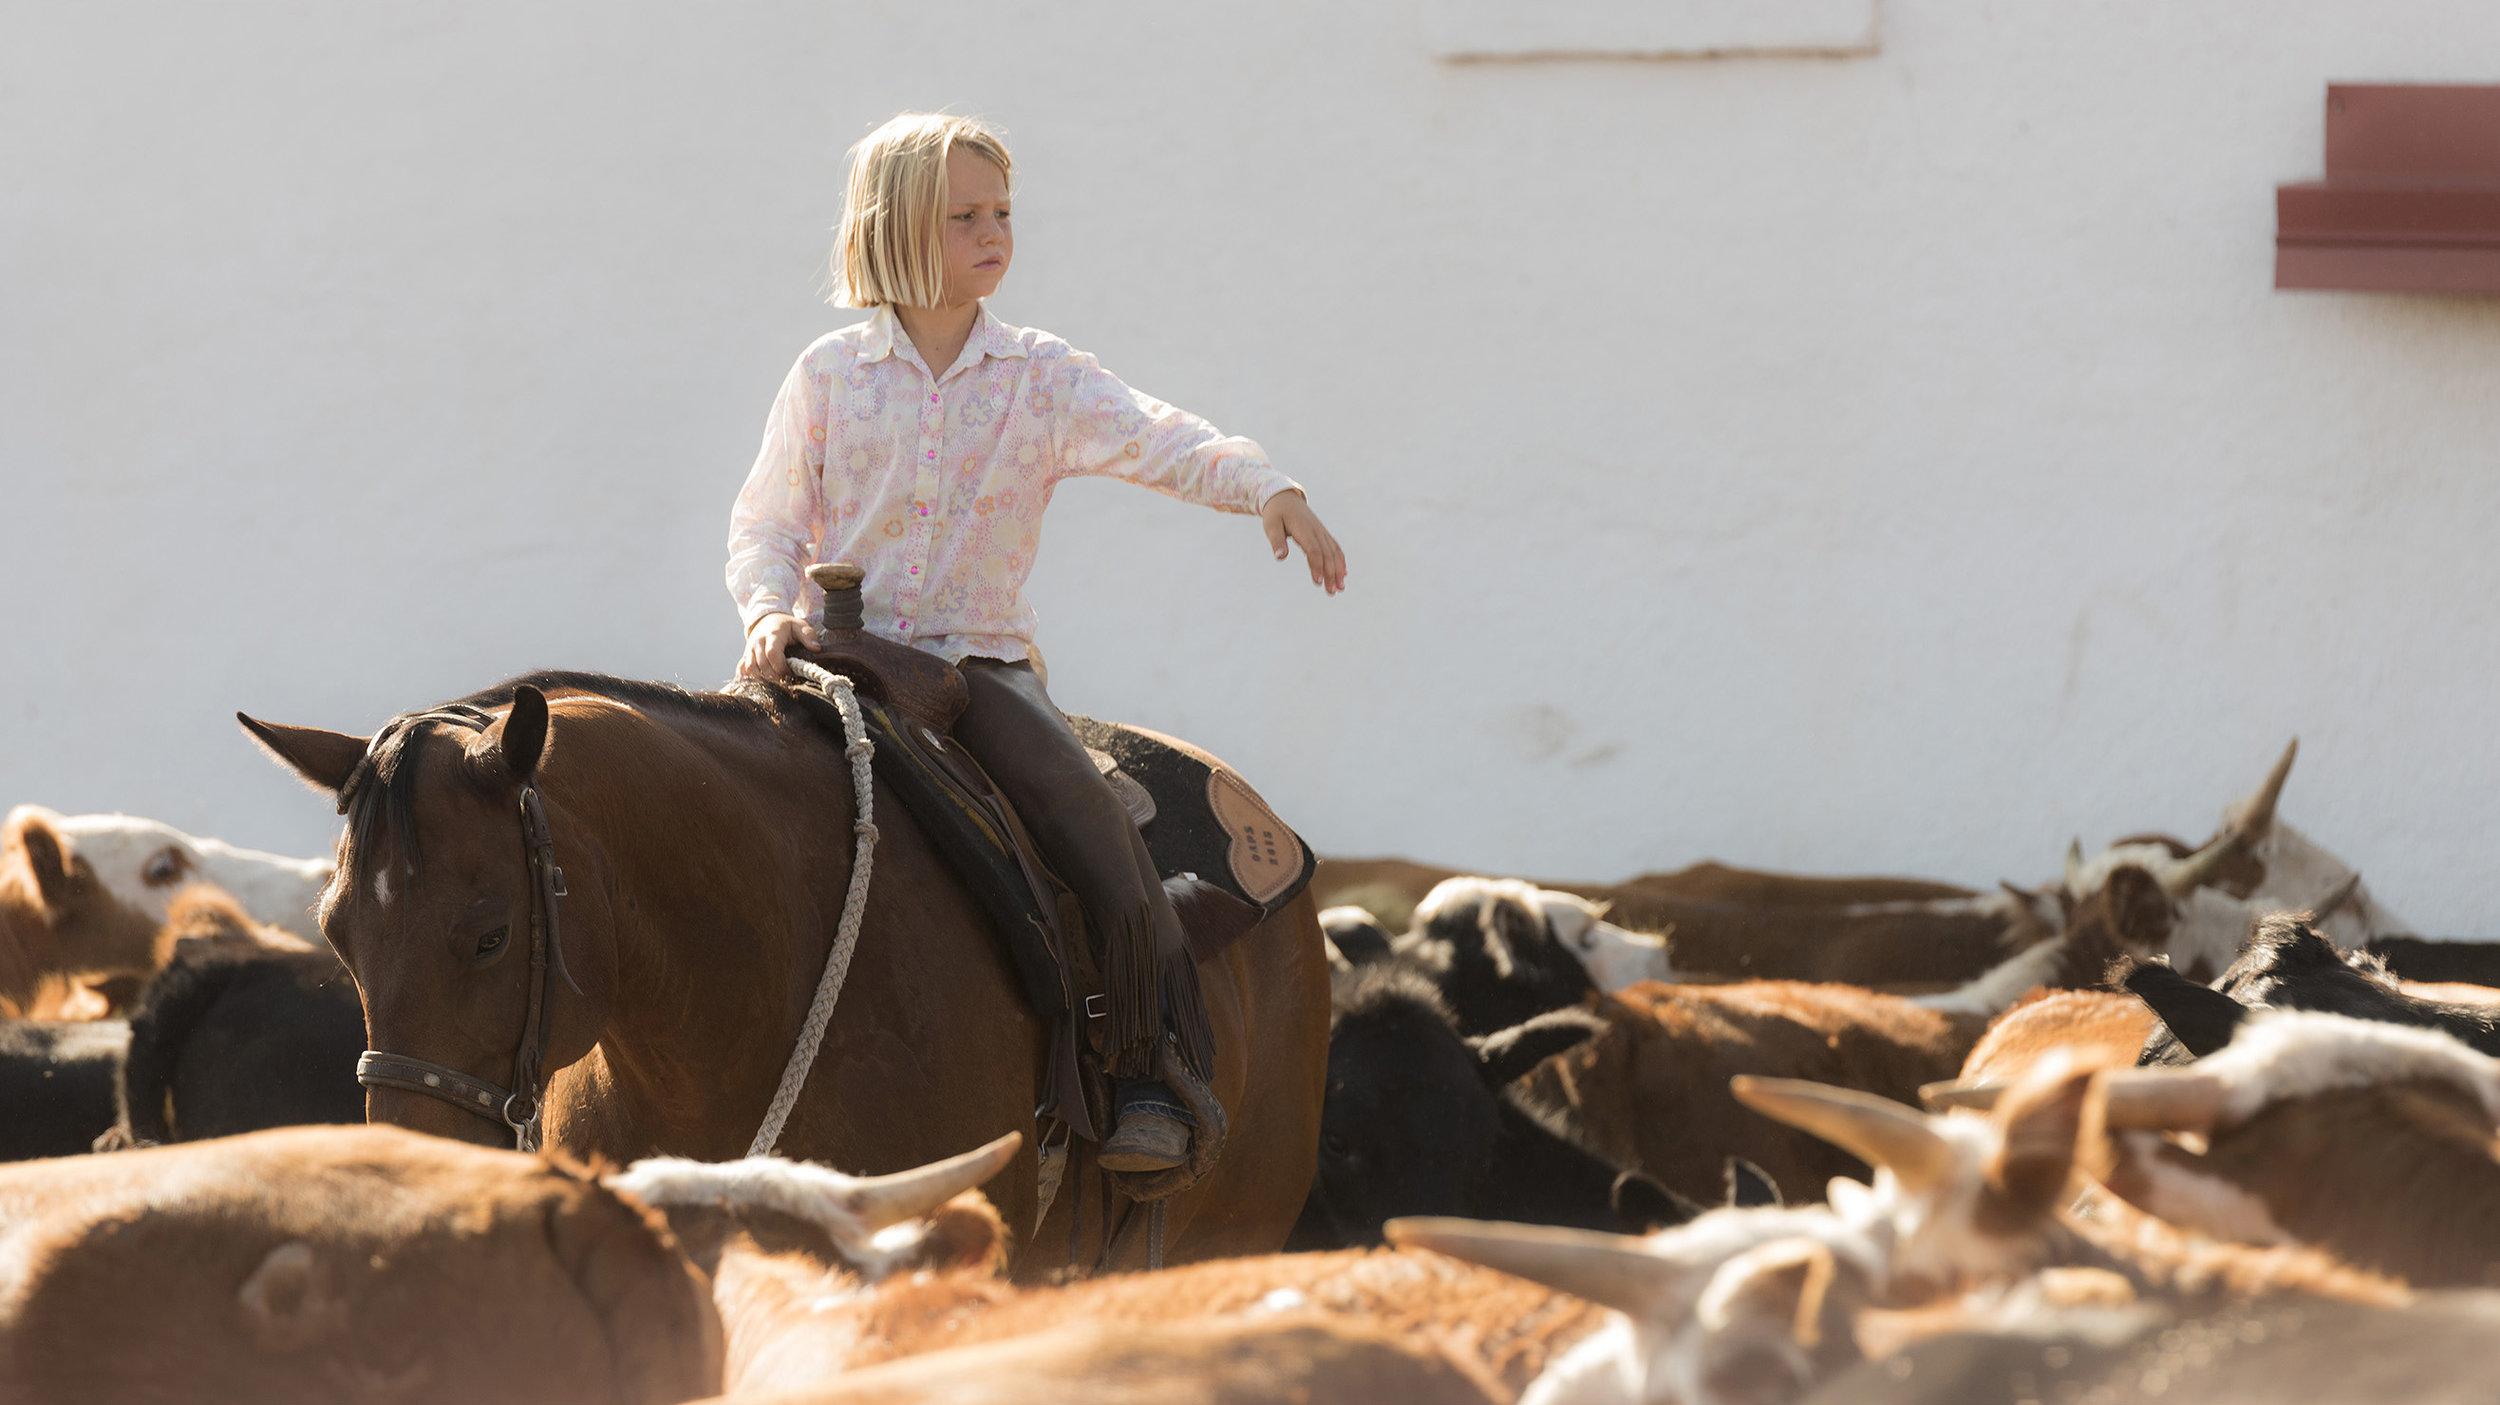 Mia Lews Works Cattle, 06 Ranch, Alpine Texas